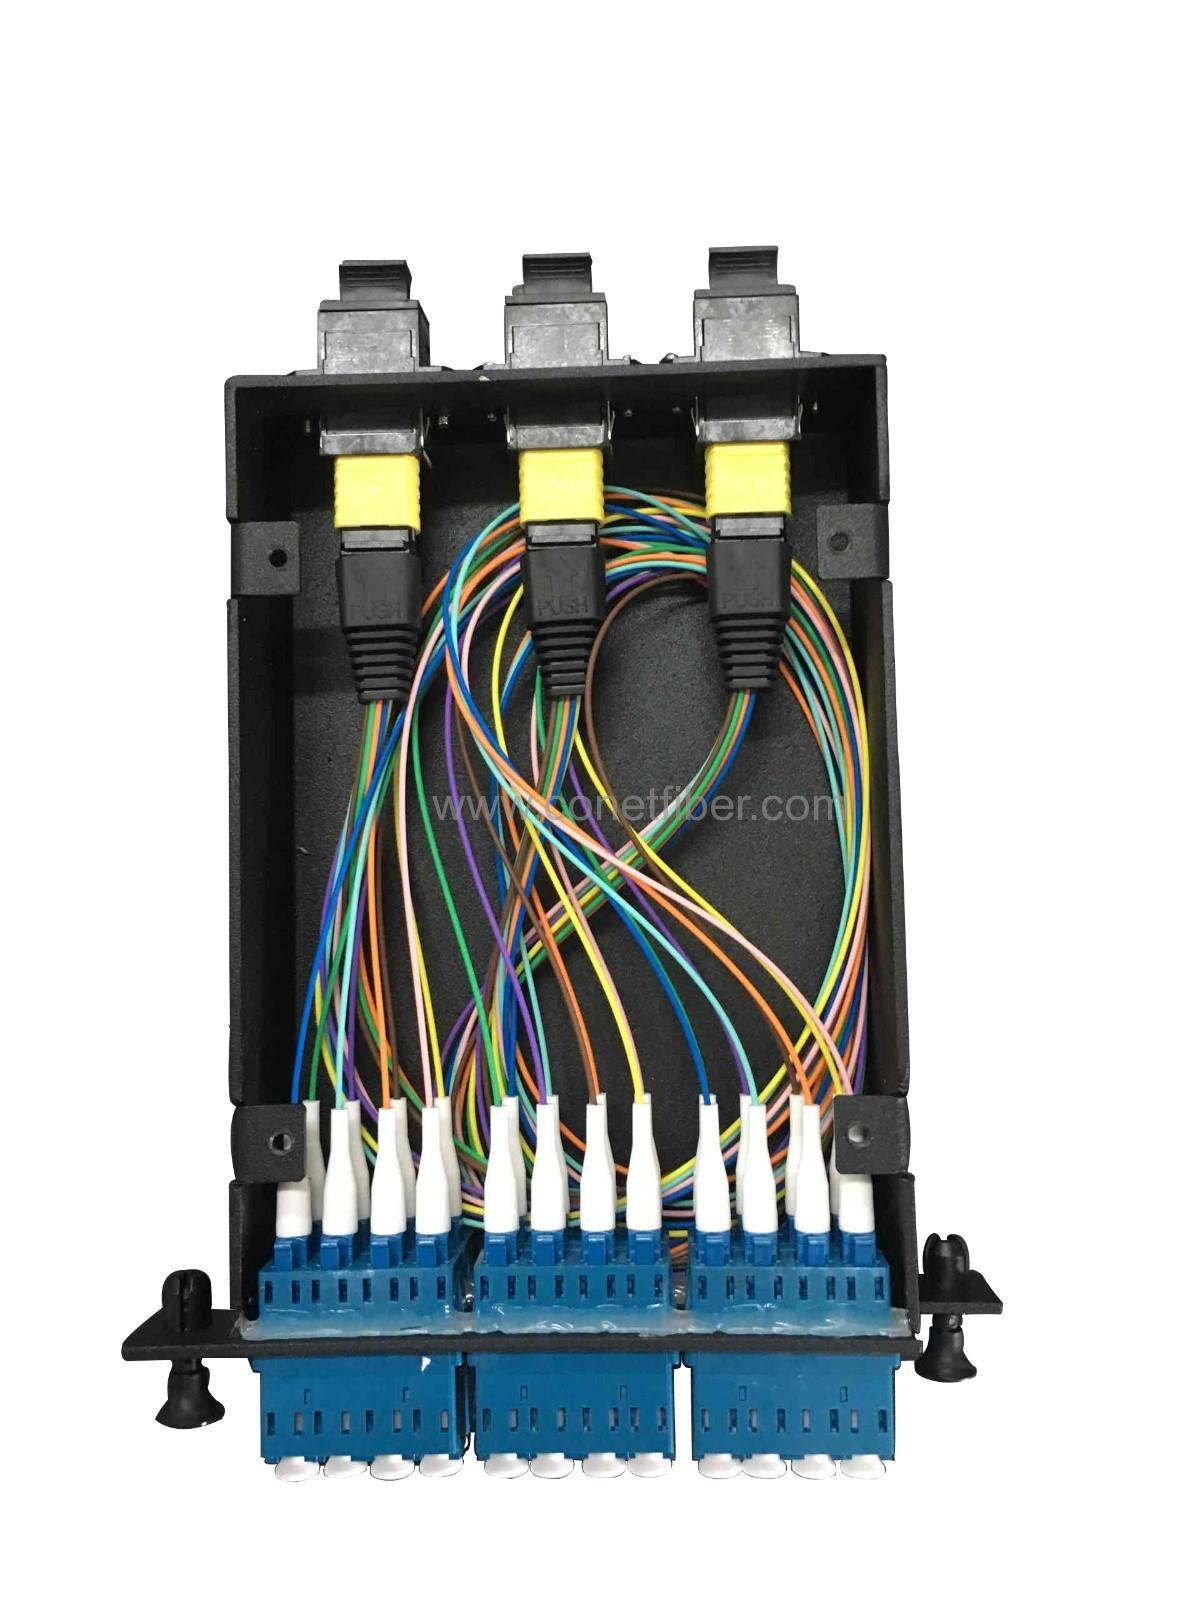 4pcs MTP LGX in 1U Rack